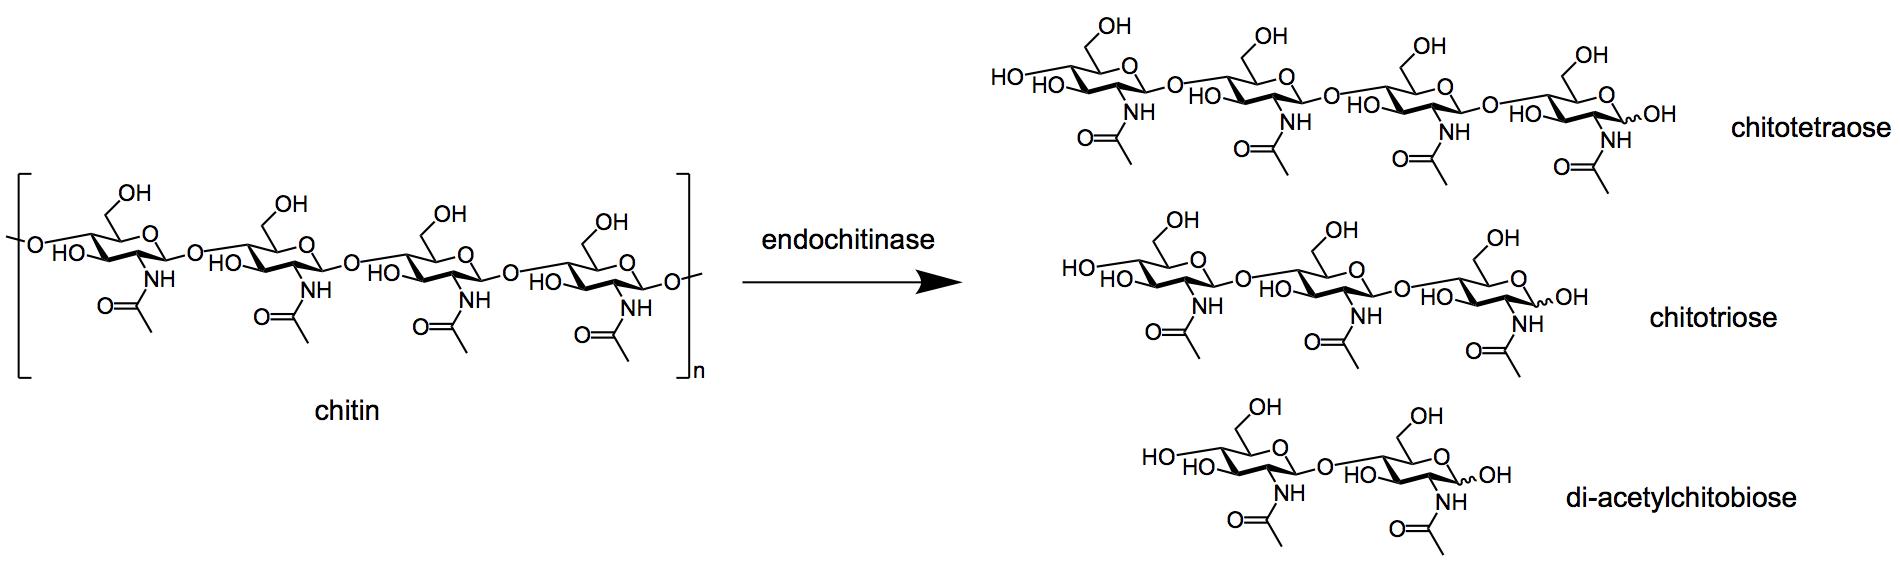 Endochitinases